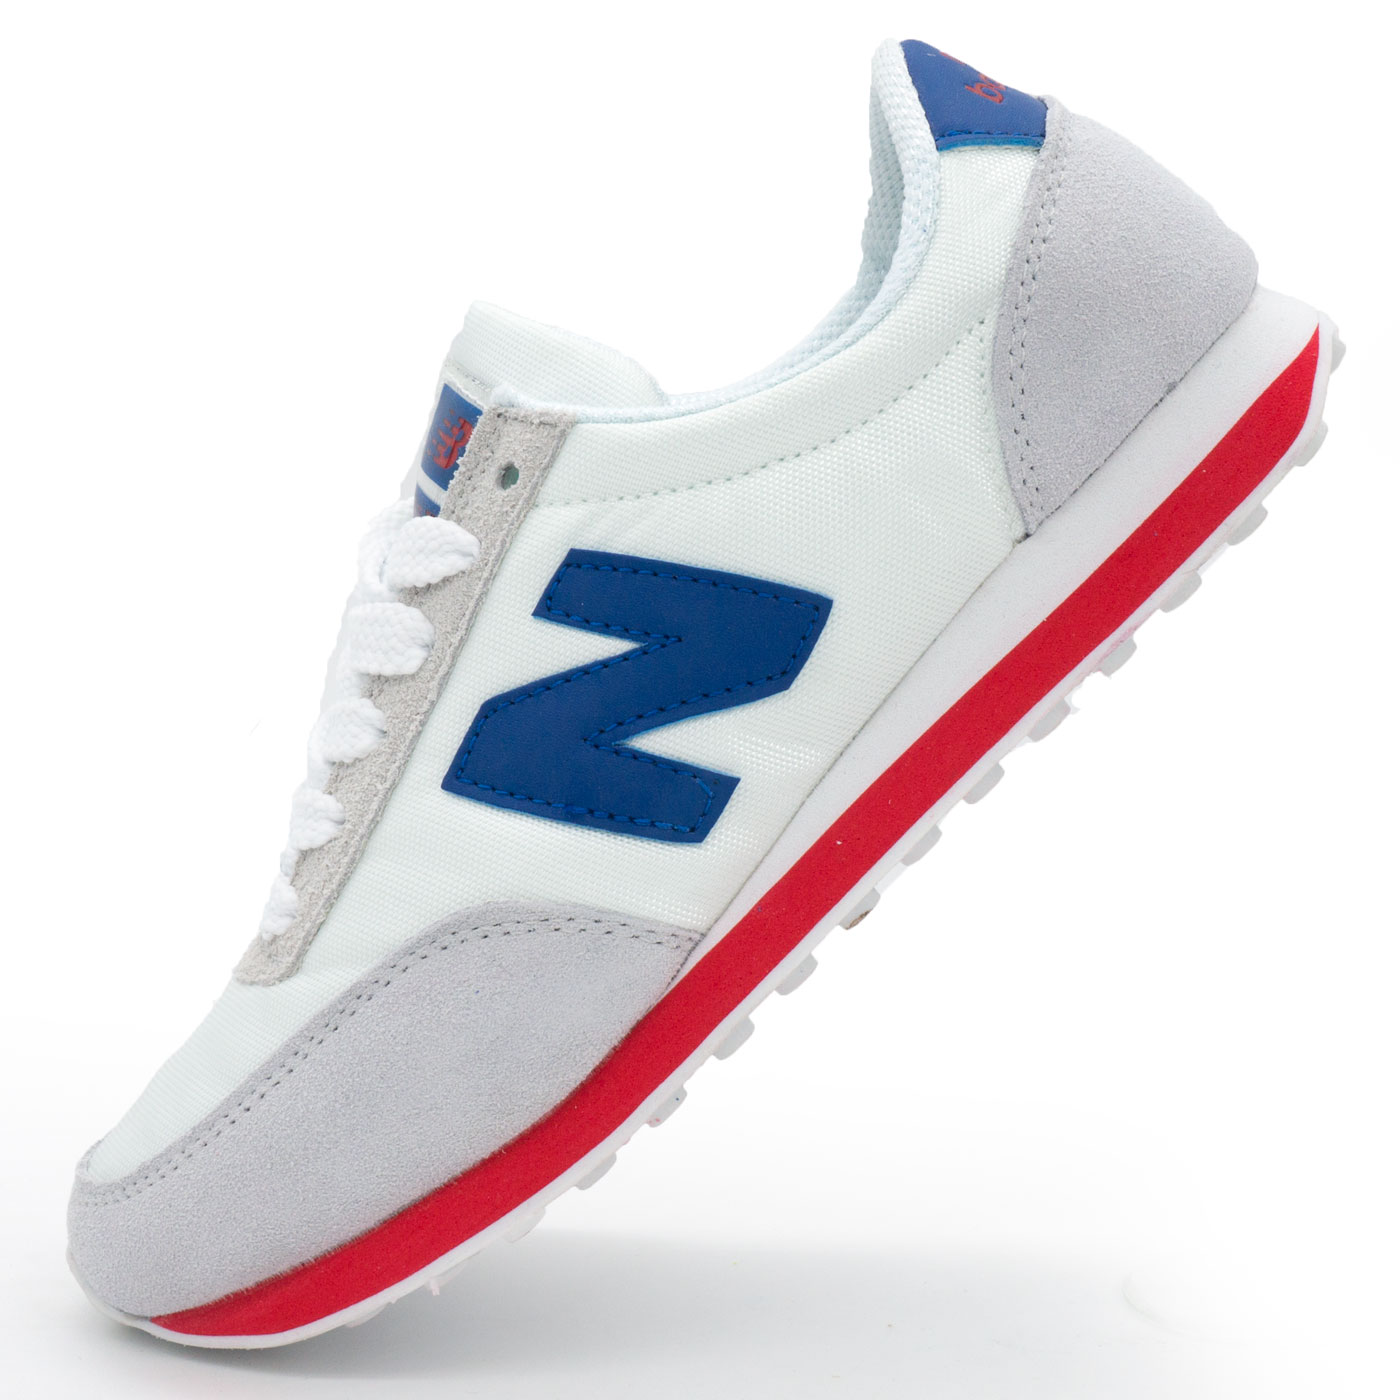 1297f2b750b603 Кроссовки New Balance 410 белые, купить New Balance 410 в интернет ...